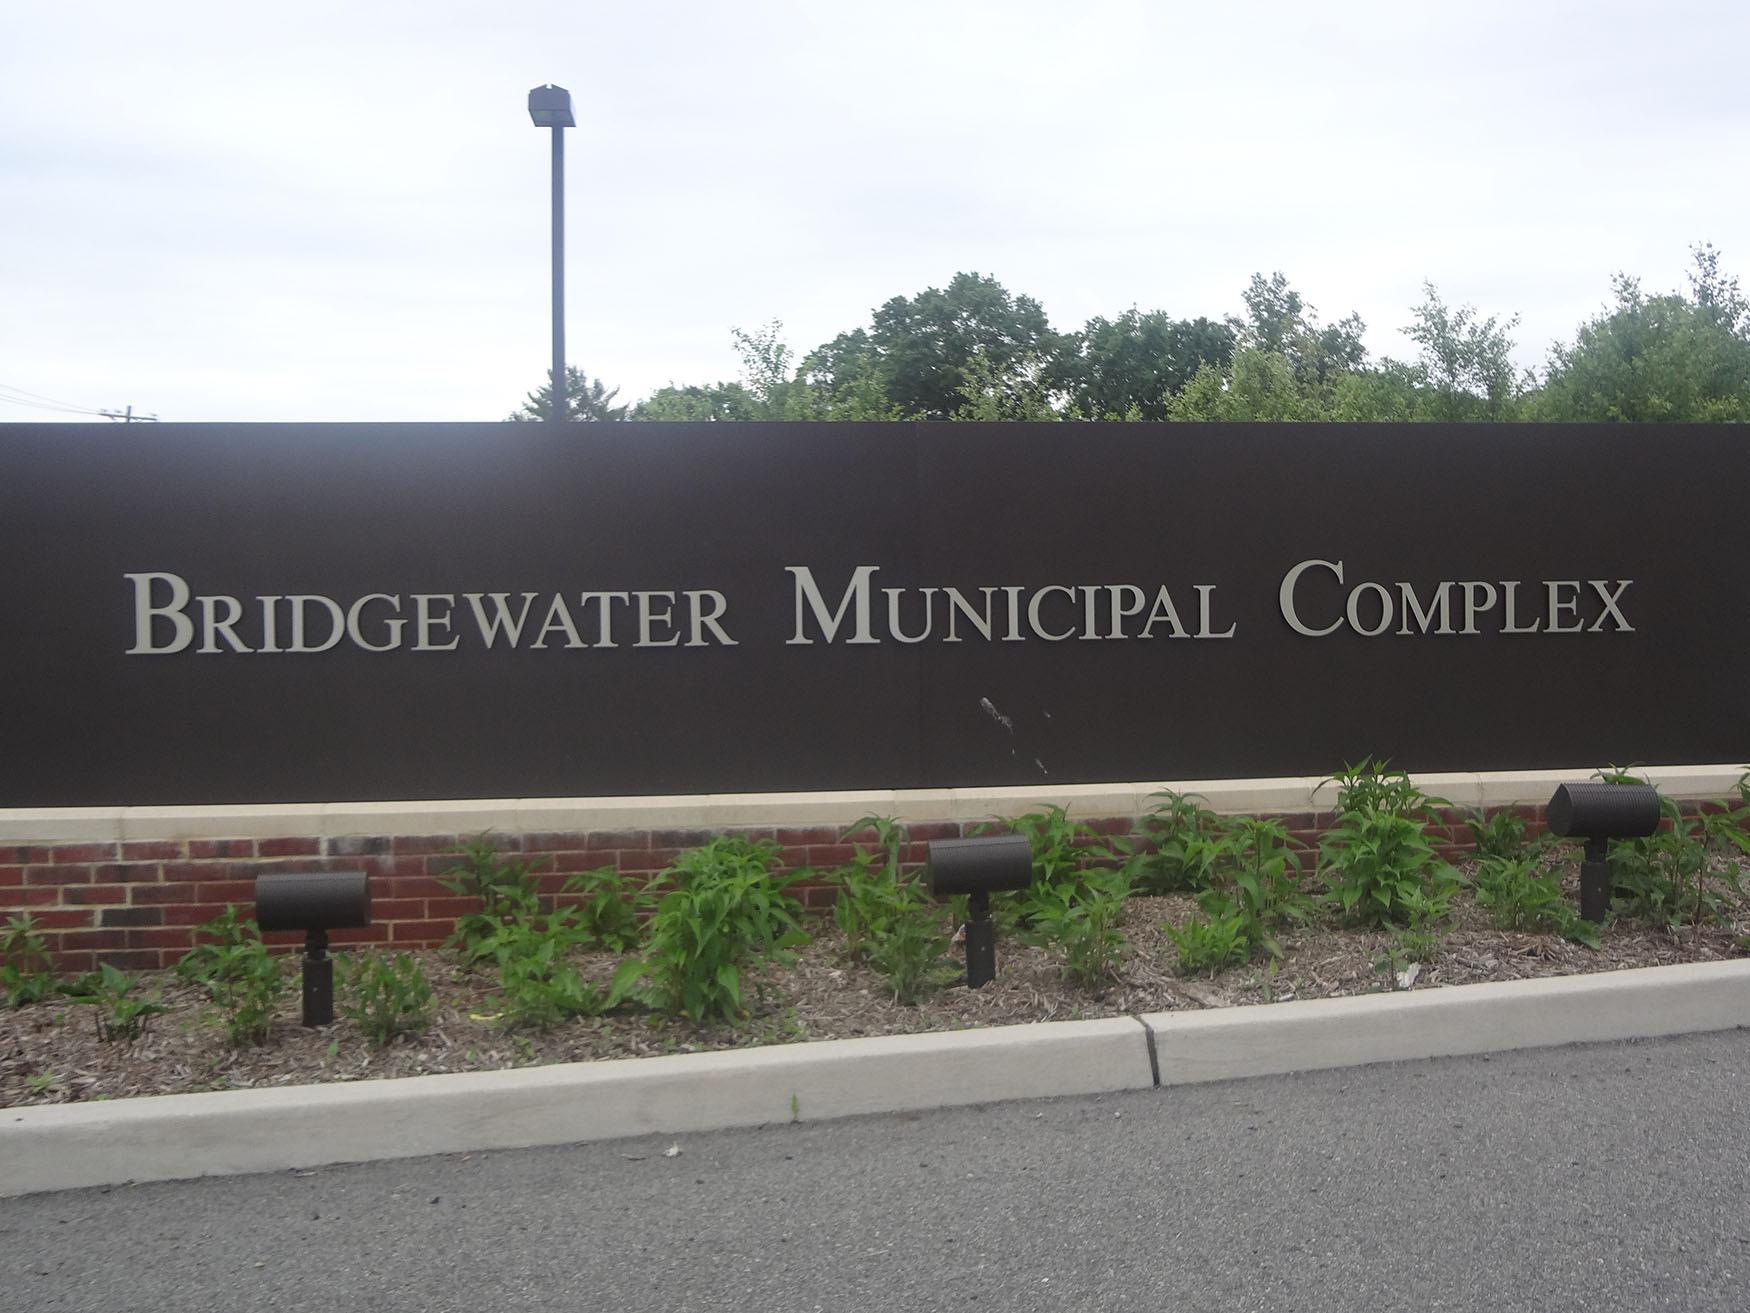 49a79fa2d07304d2bcf0_Bridgewater_municipal.jpg